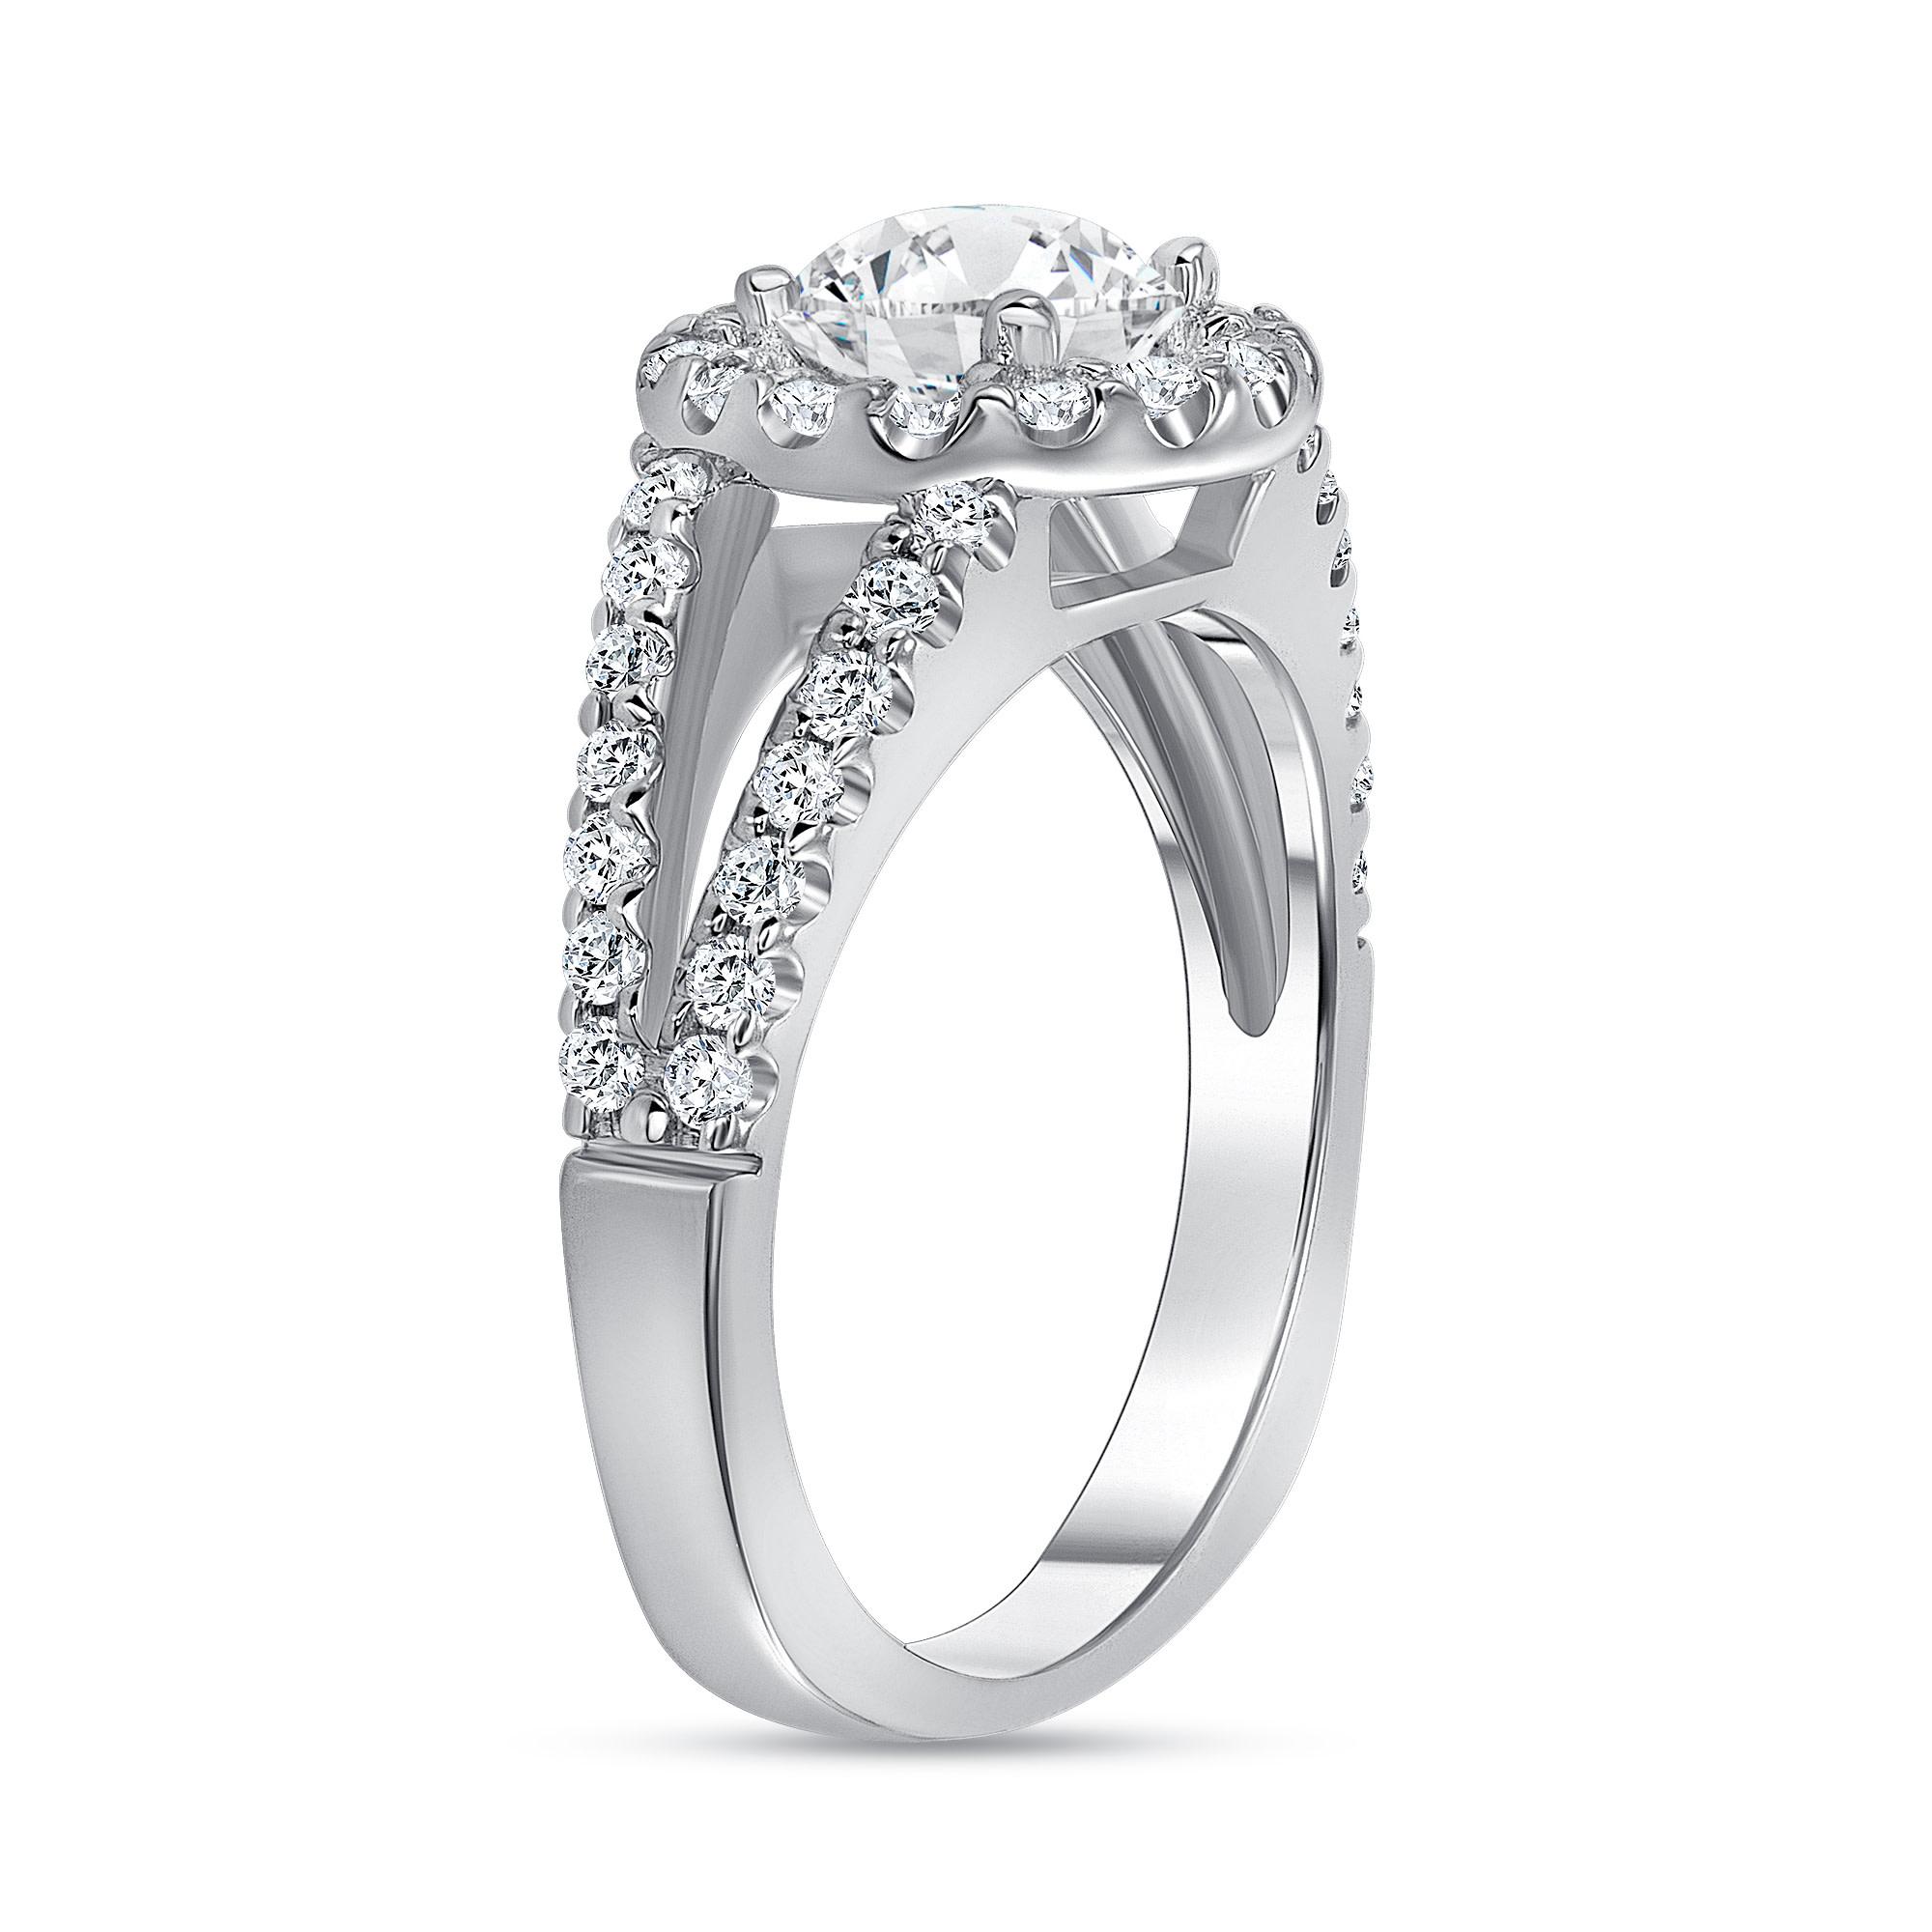 1.5 carat round halo engagement ring white gold